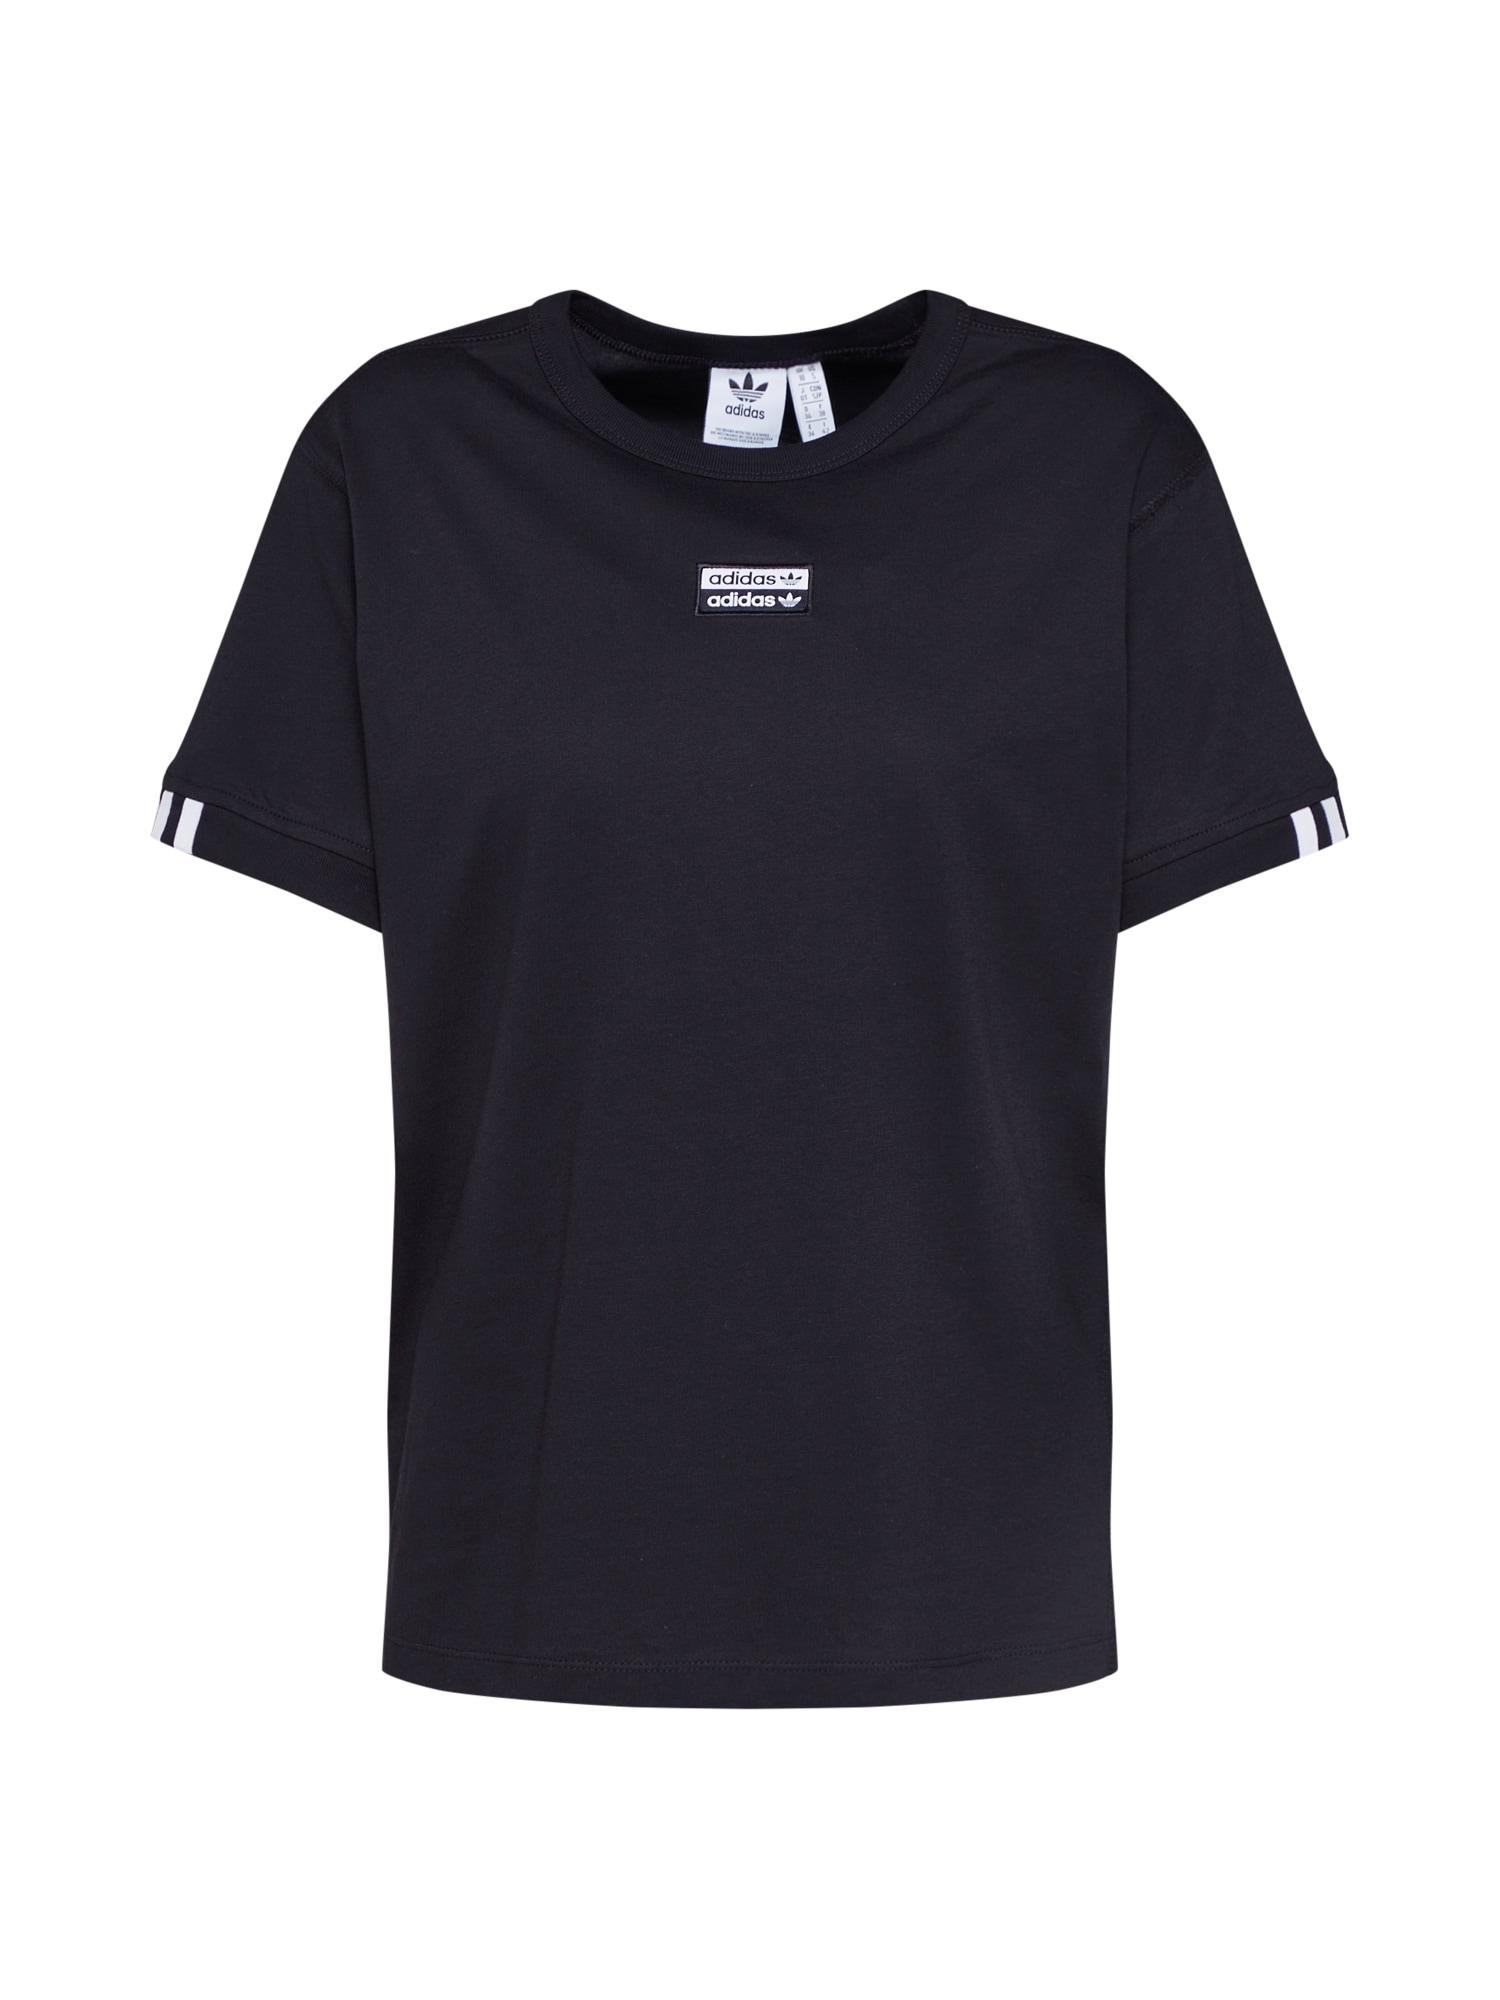 ADIDAS ORIGINALS Tričko  černá